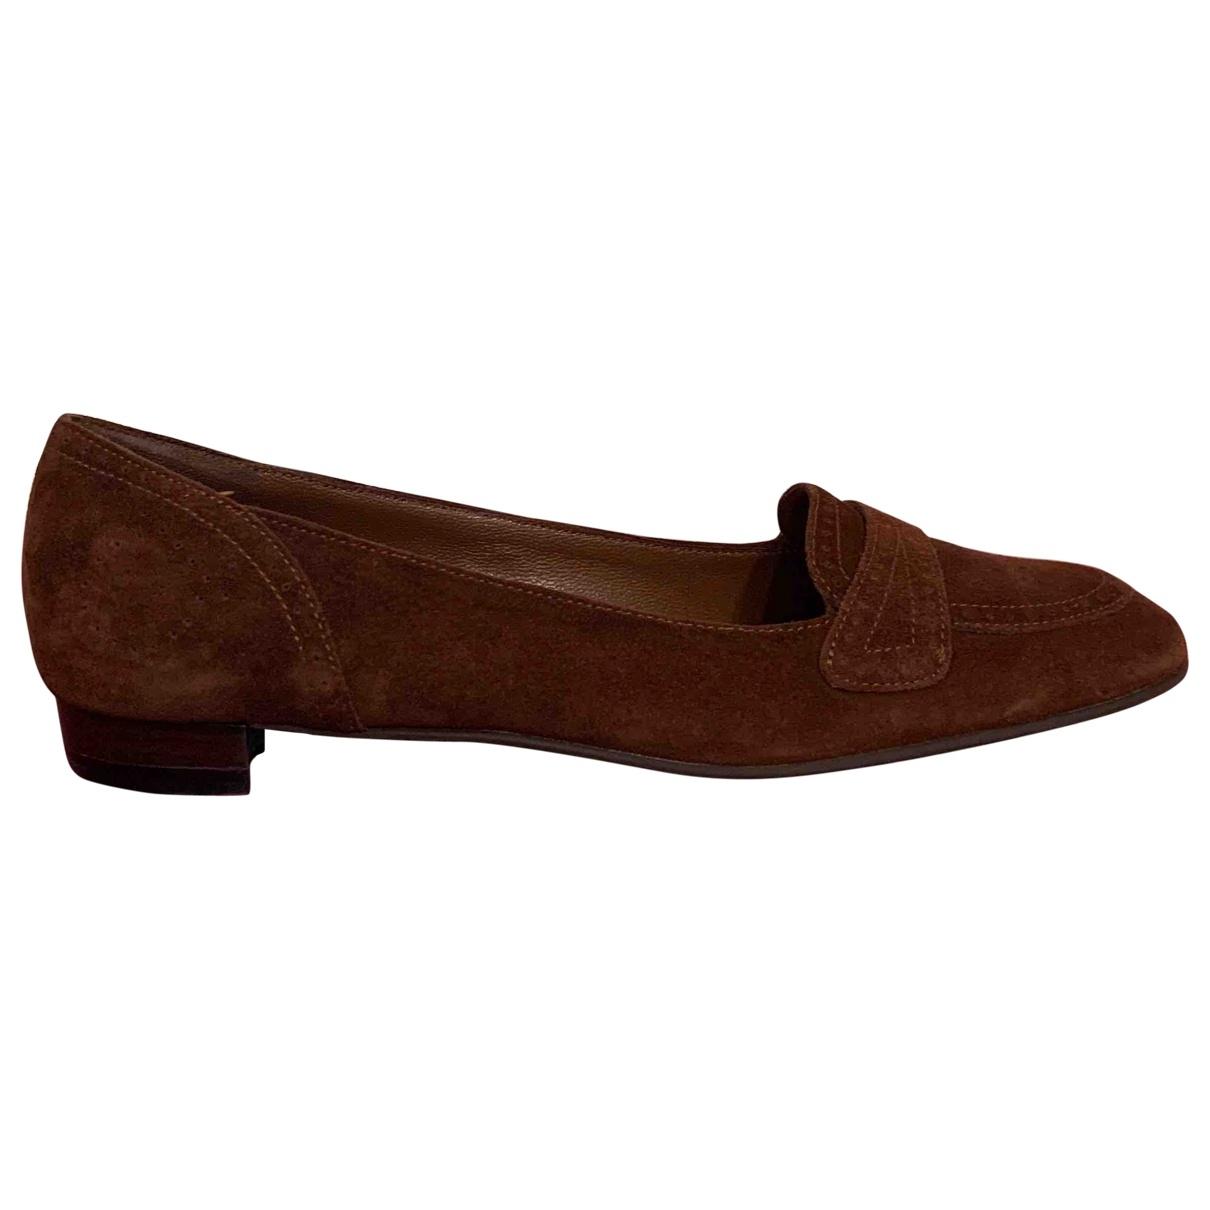 Salvatore Ferragamo \N Brown Suede Flats for Women 35.5 IT